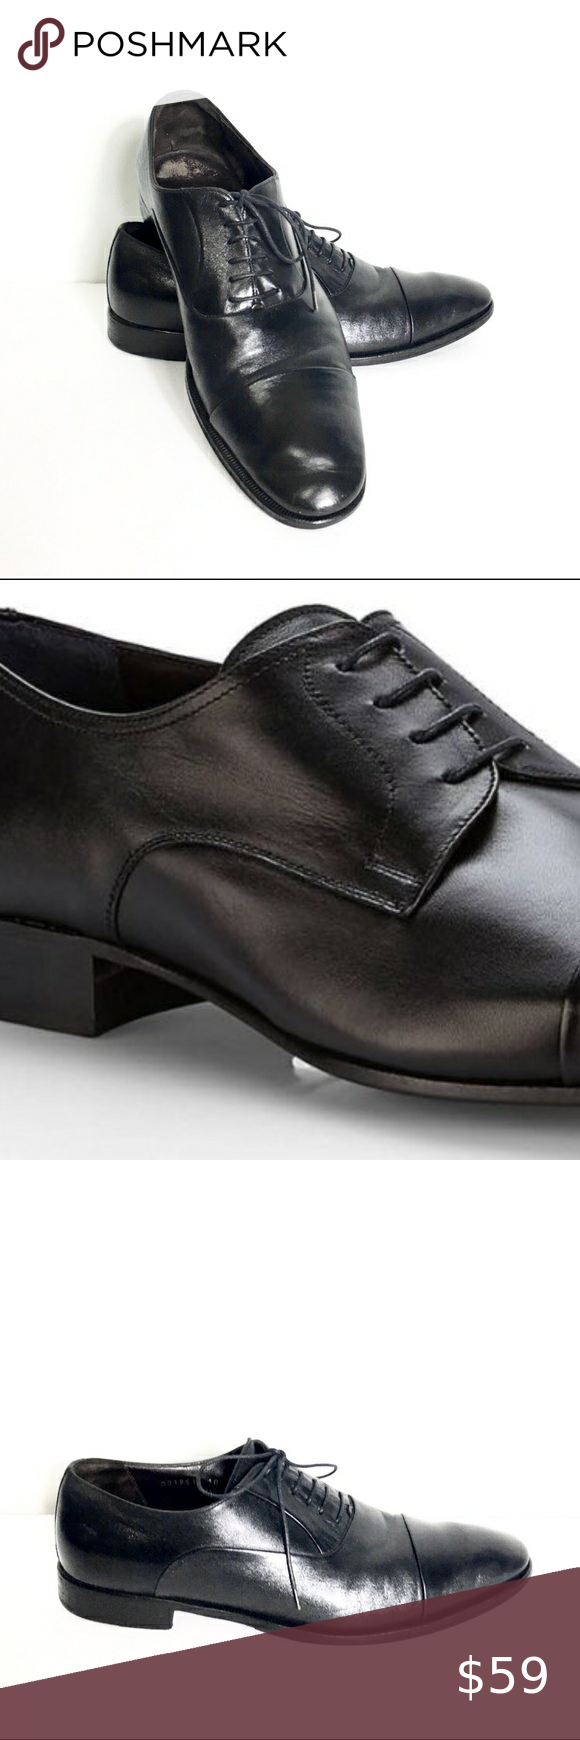 Brunomagli Men S Black Shoes Made In Italy 10 Black Shoes Dress Shoes Men Black Leather Dresses [ 1740 x 580 Pixel ]